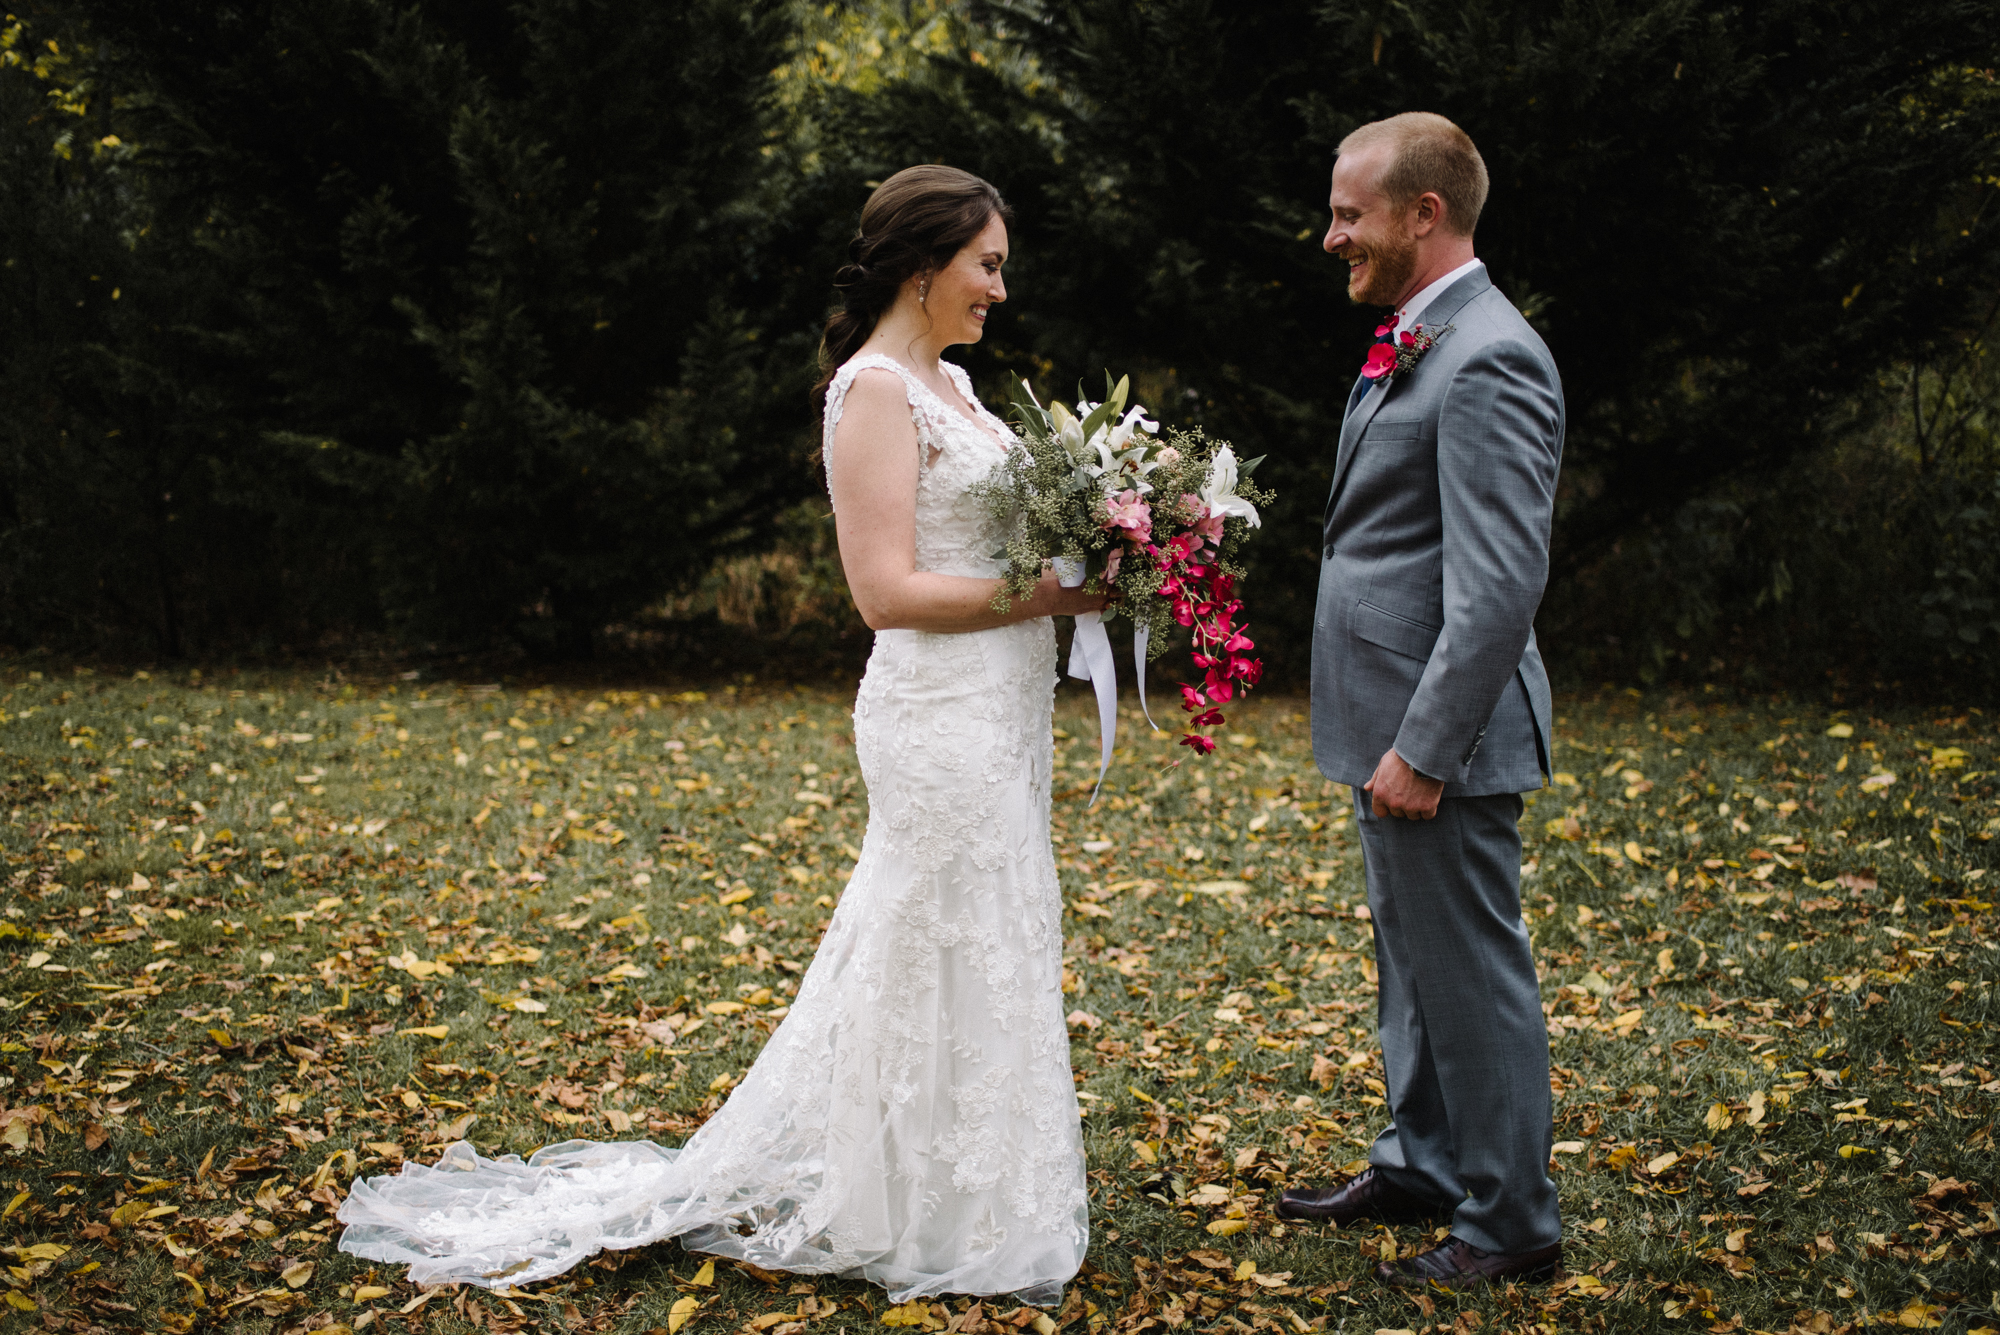 Mandi-and-Jordan-Intimate-Backyard-River-Wedding-Shenandoah-Valley_17.JPG